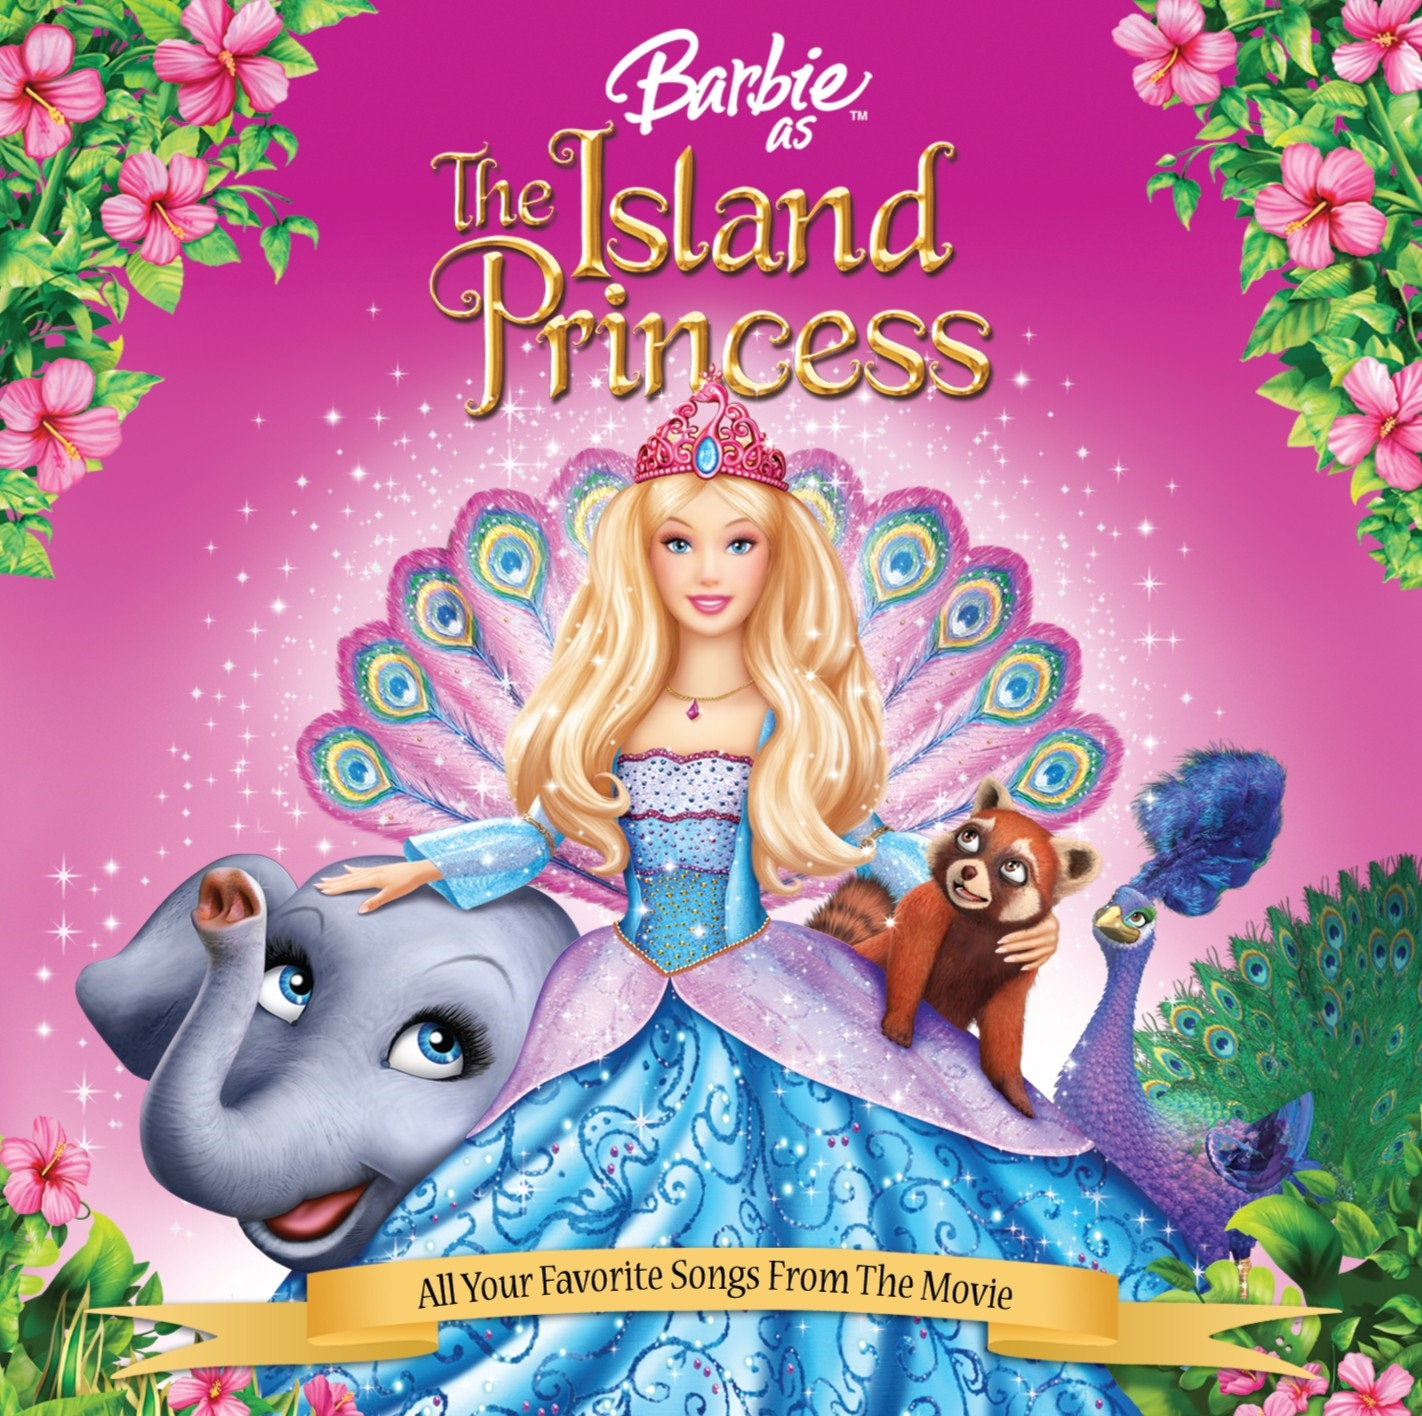 barbie-the-island-princess